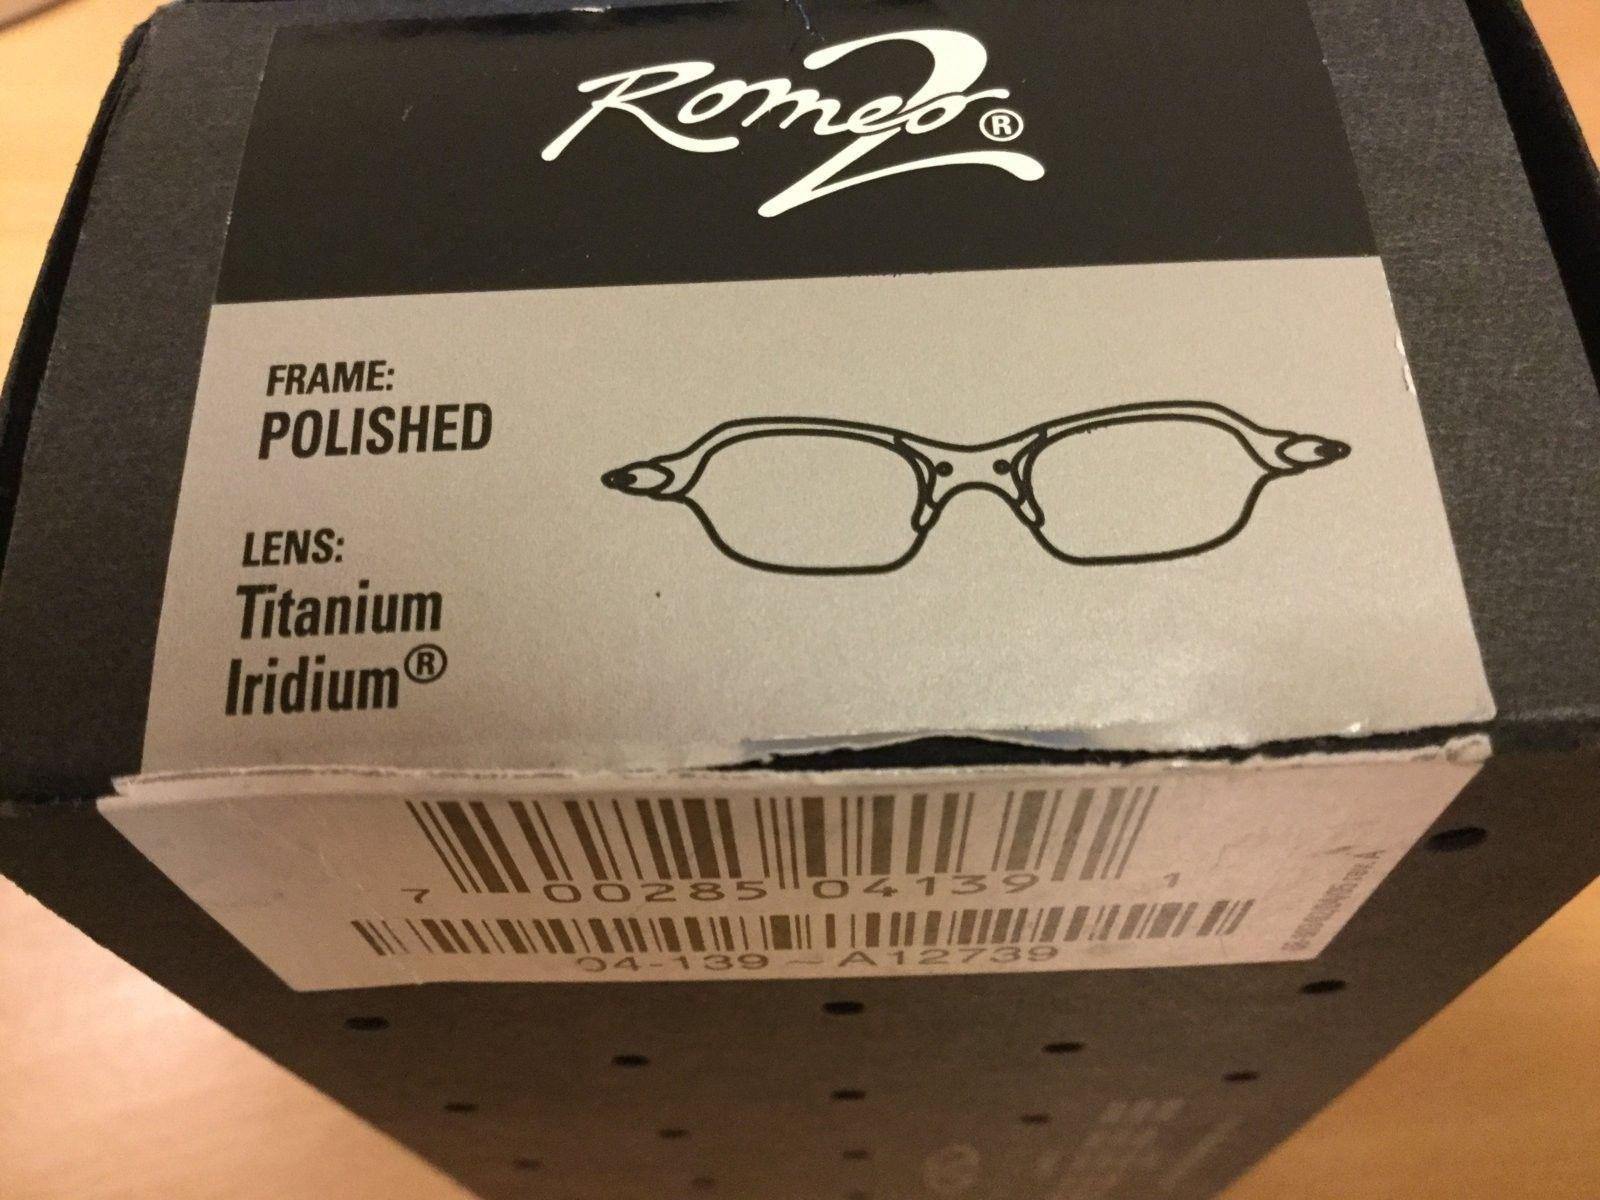 Romeo 1 and 2 boxes - IMG_3624.JPG